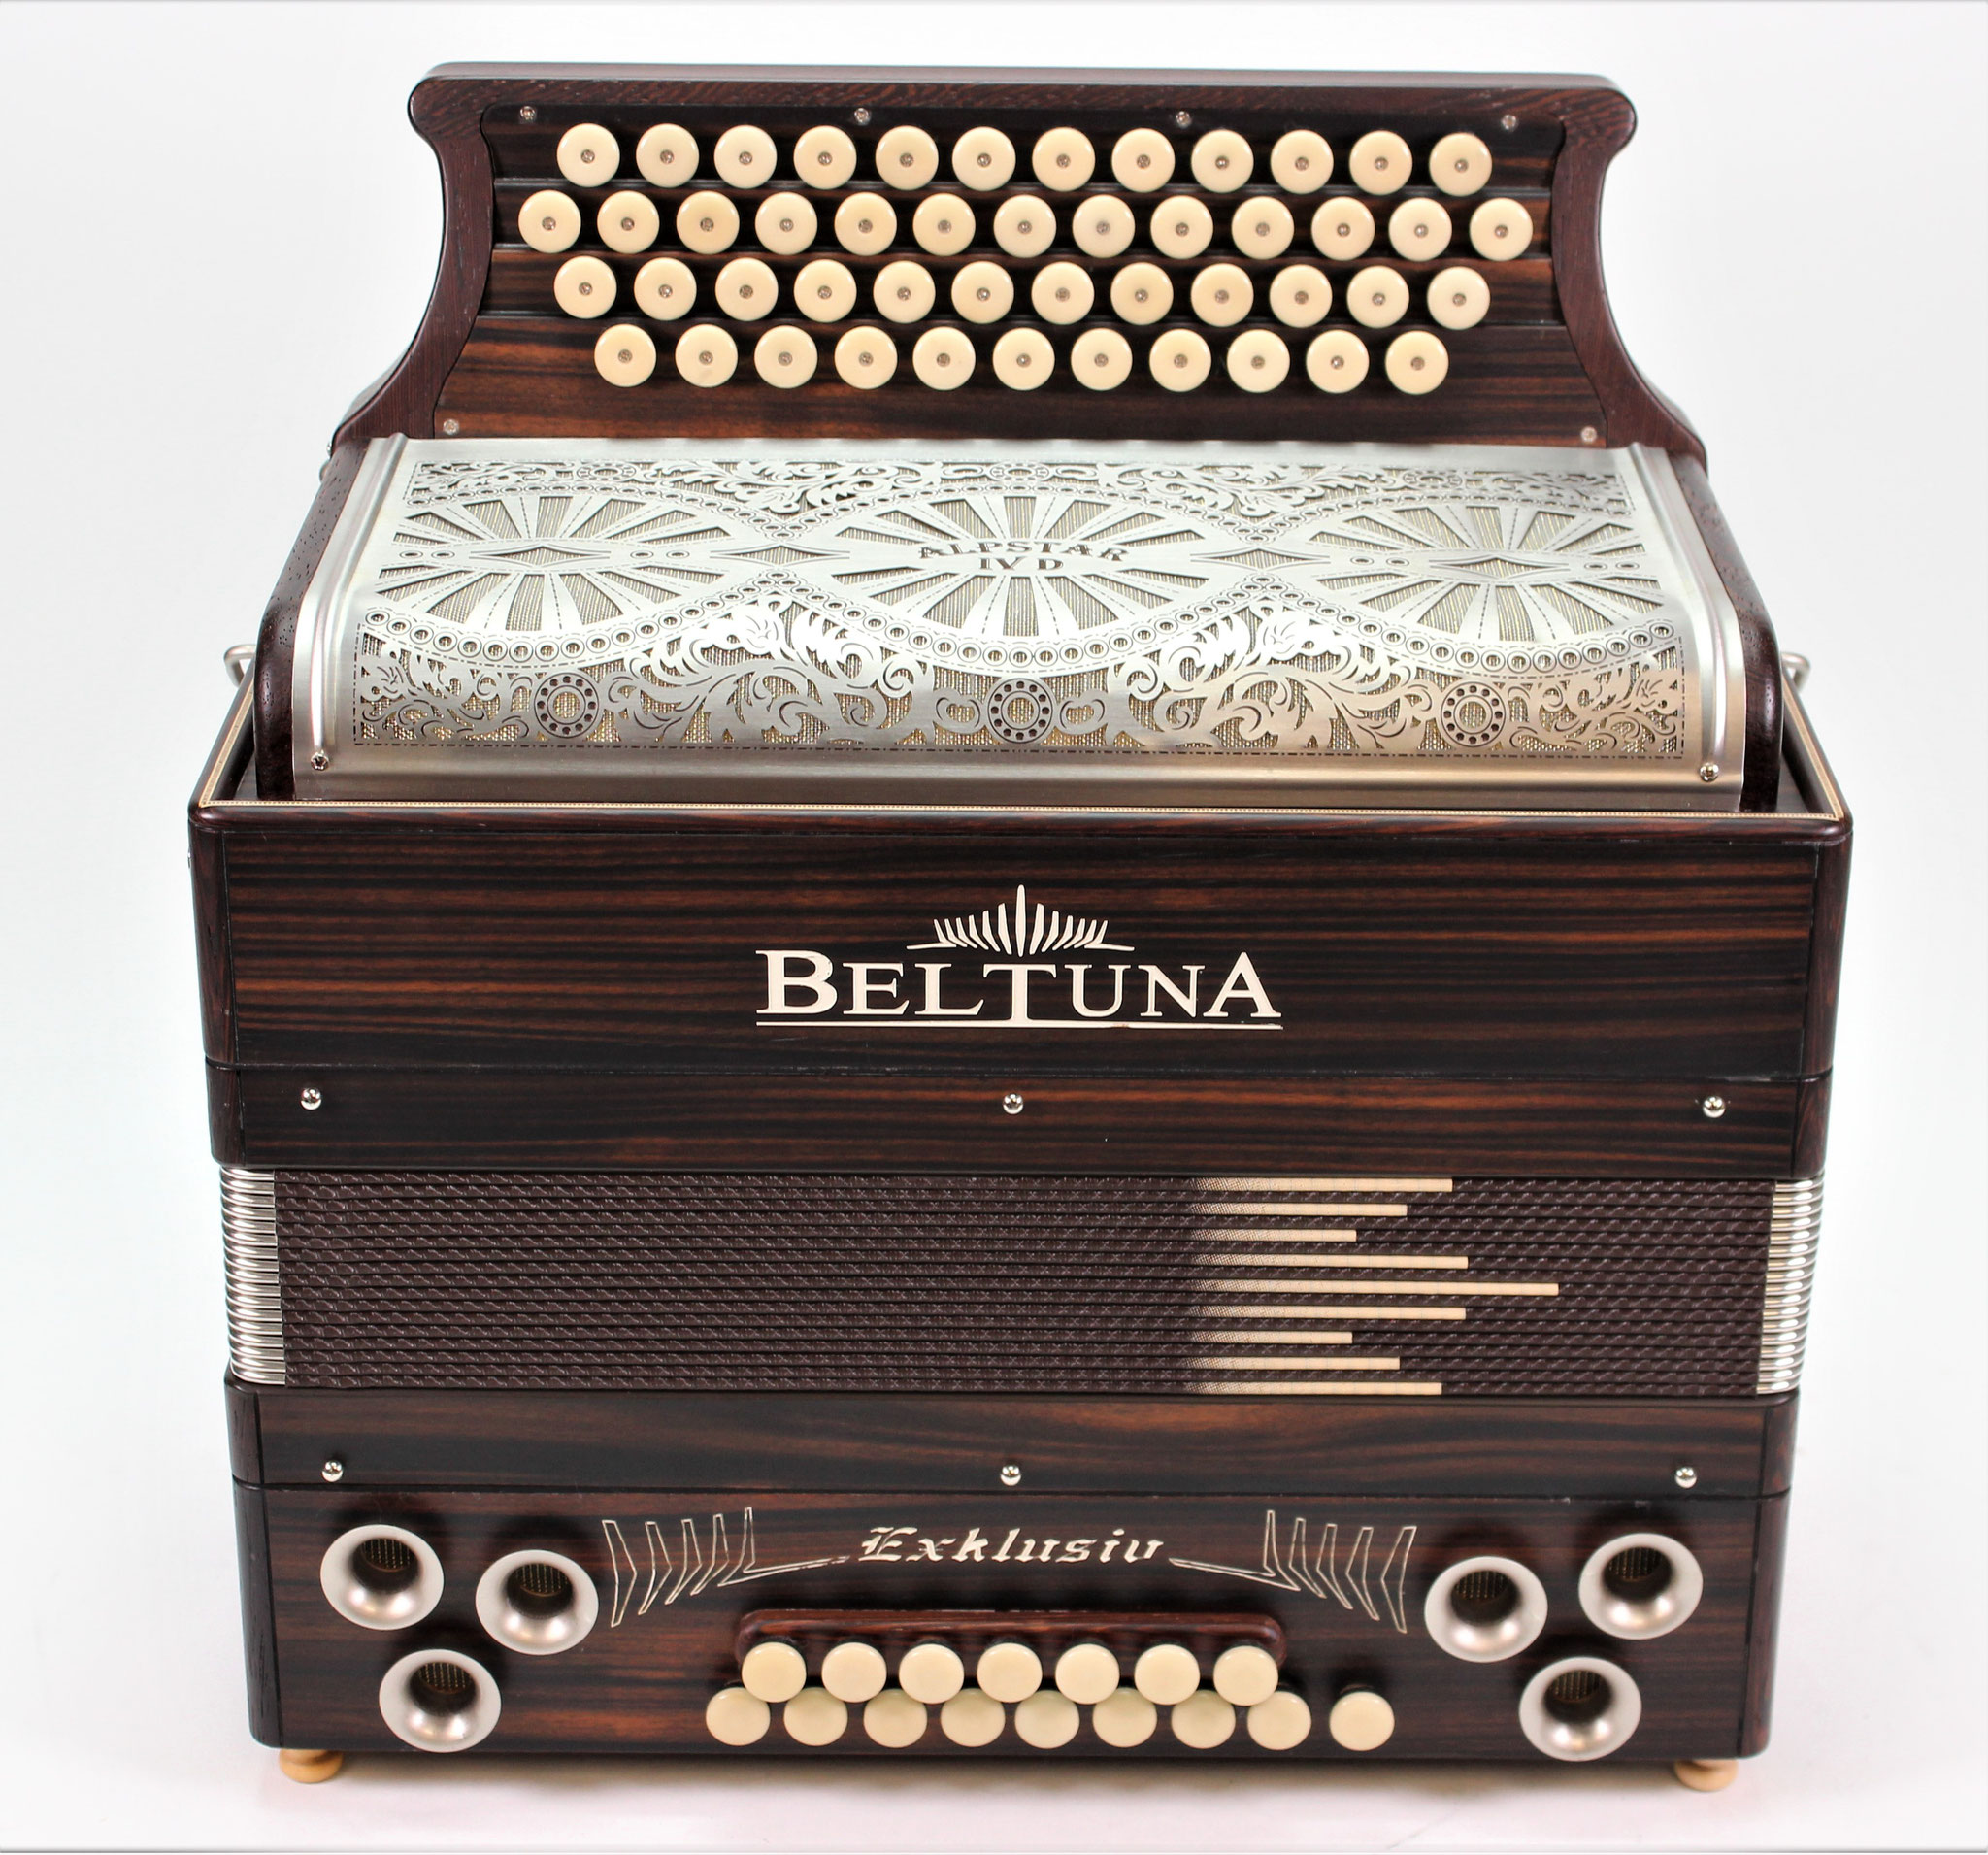 Beltuna Alpstar IV D Exklusiv, ebano